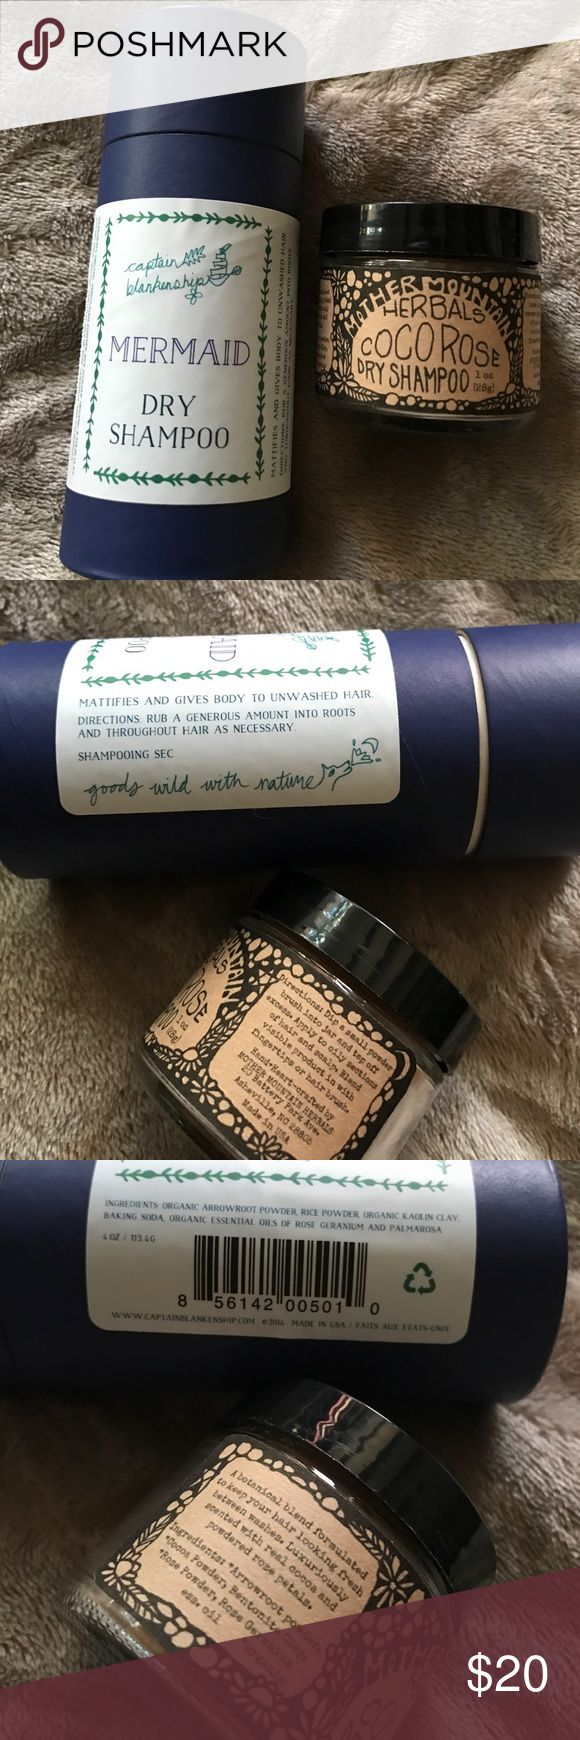 Dry Shampoo NWT Sephora Hair accessories and January